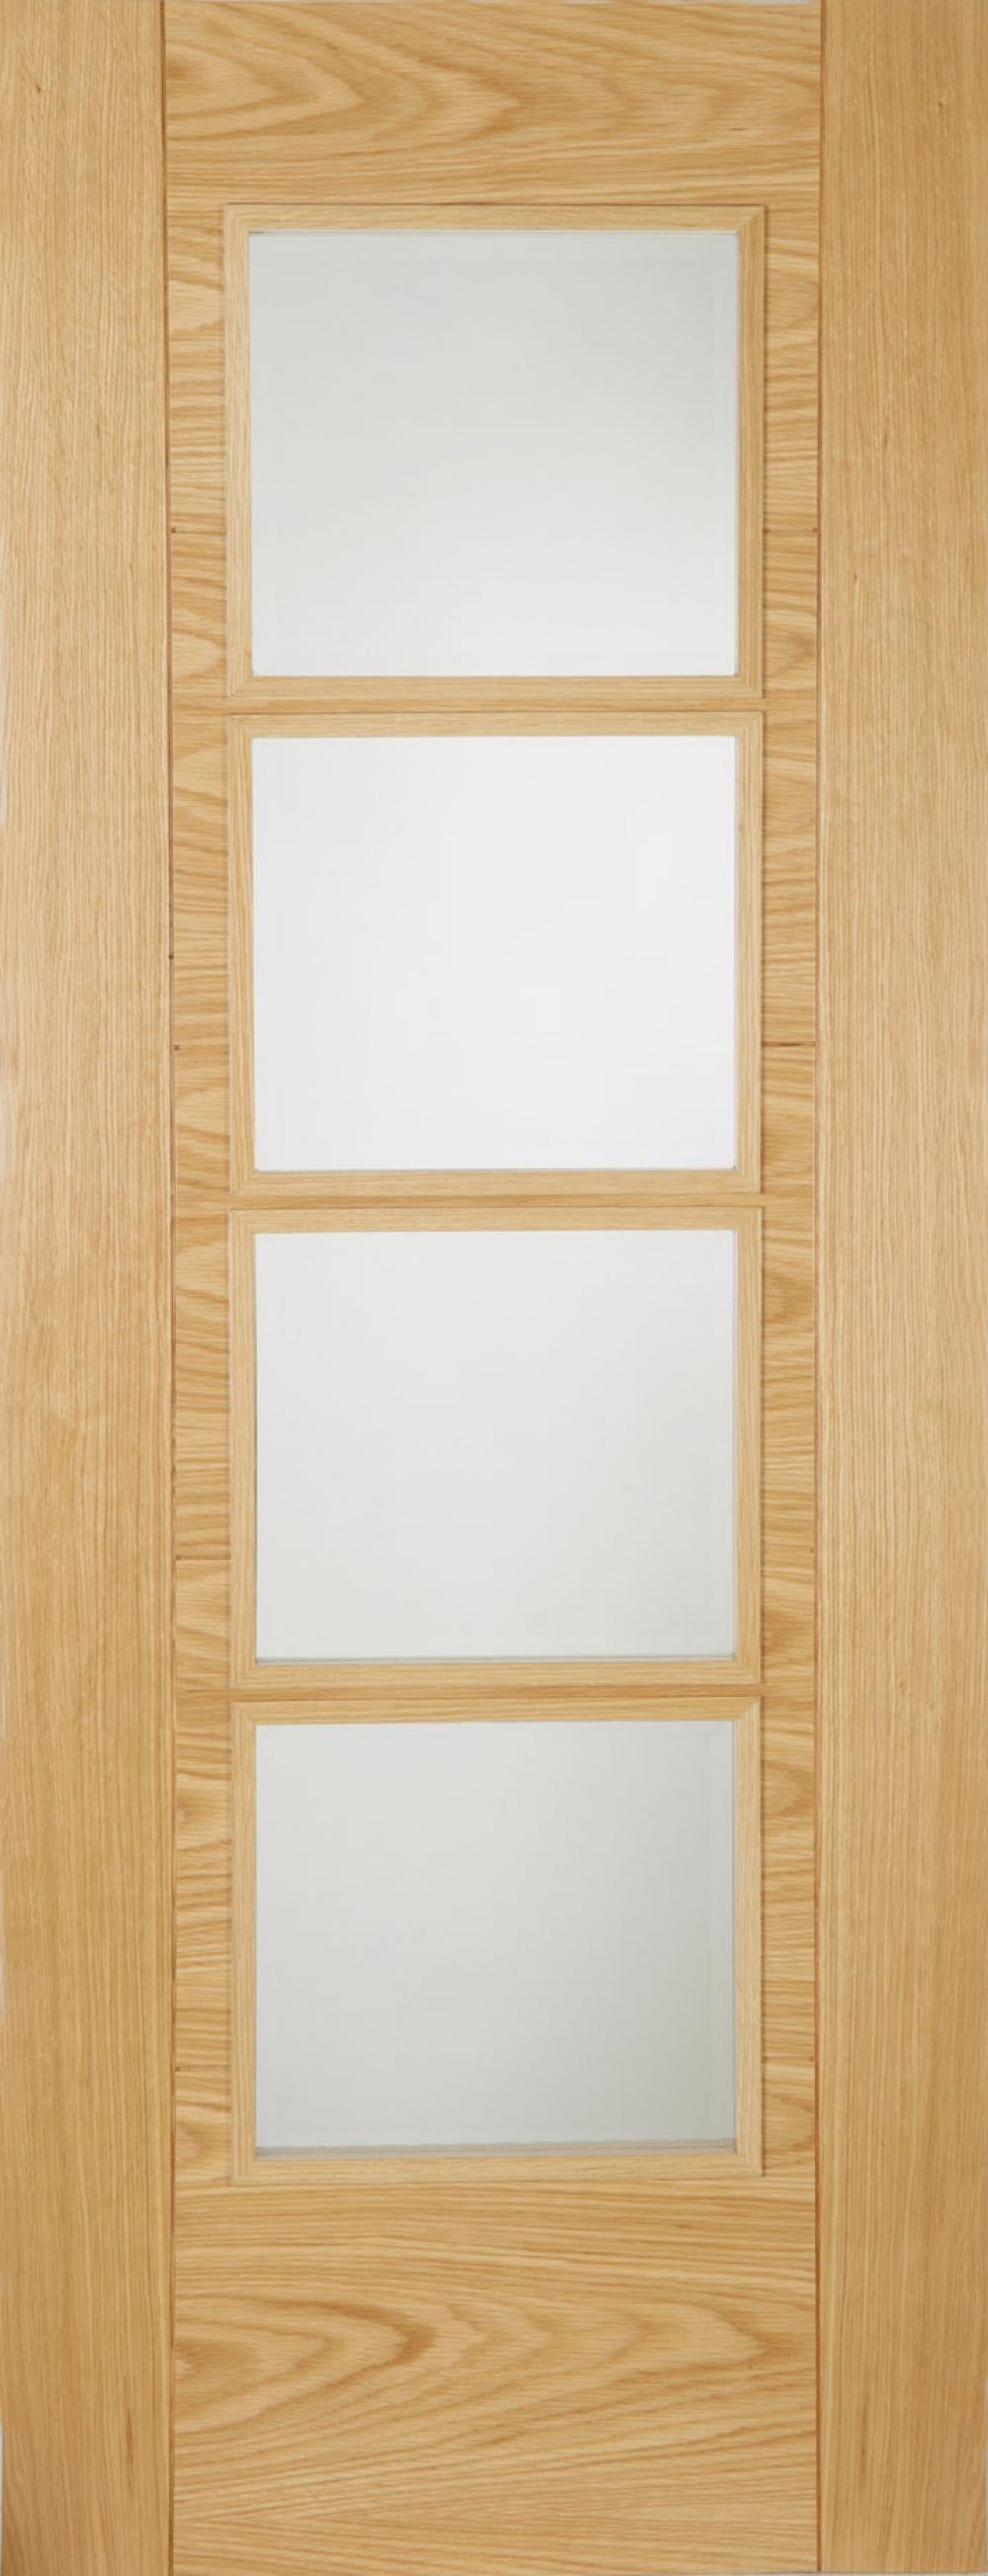 Iseo Oak 4 Light Frosted Glass - Prefinished Image